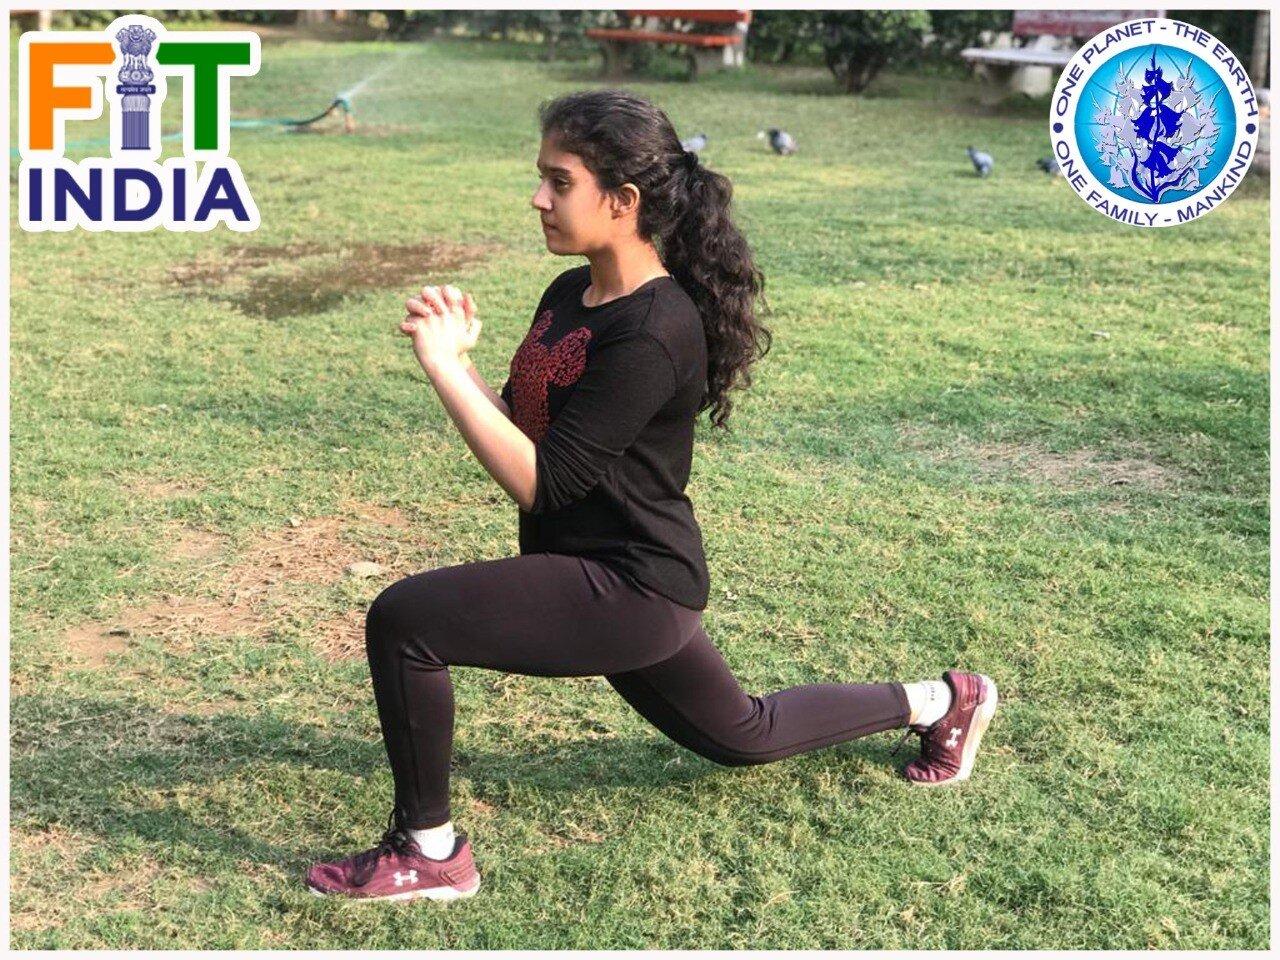 fit_india.jpg